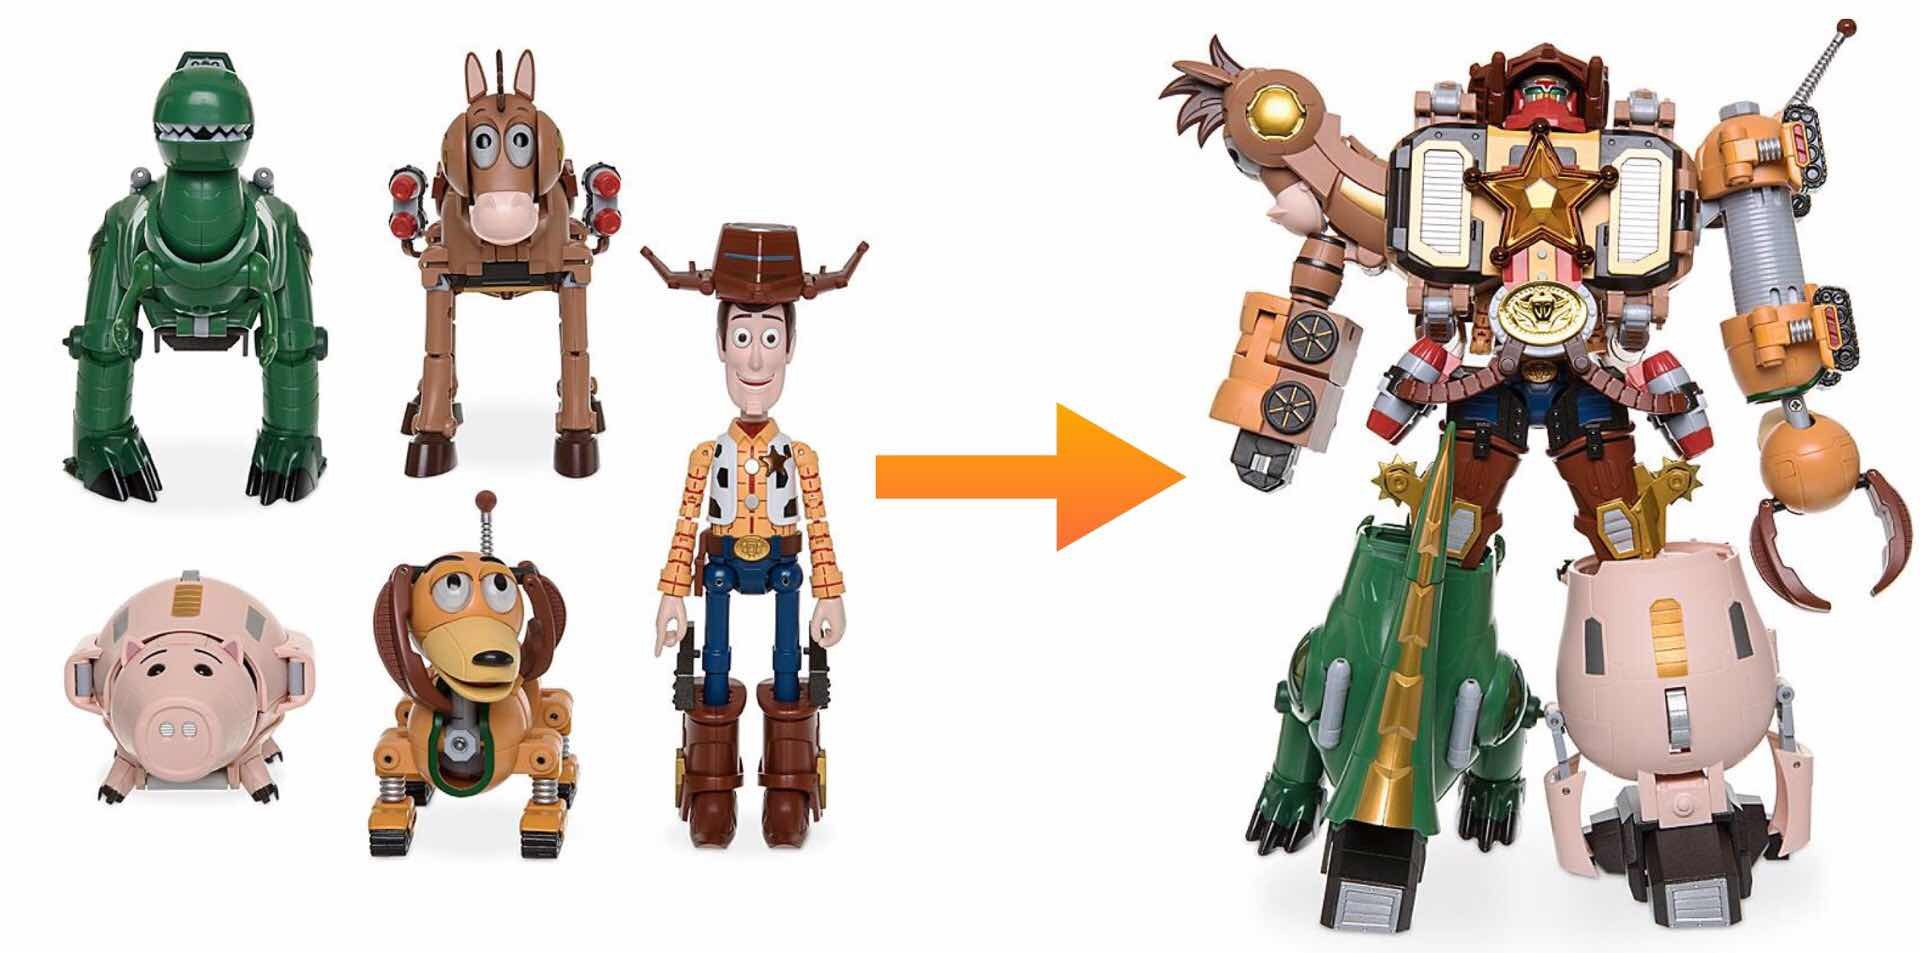 disney-bandai-toy-story-chogokin-mecha-toys-woody-sheriff-star